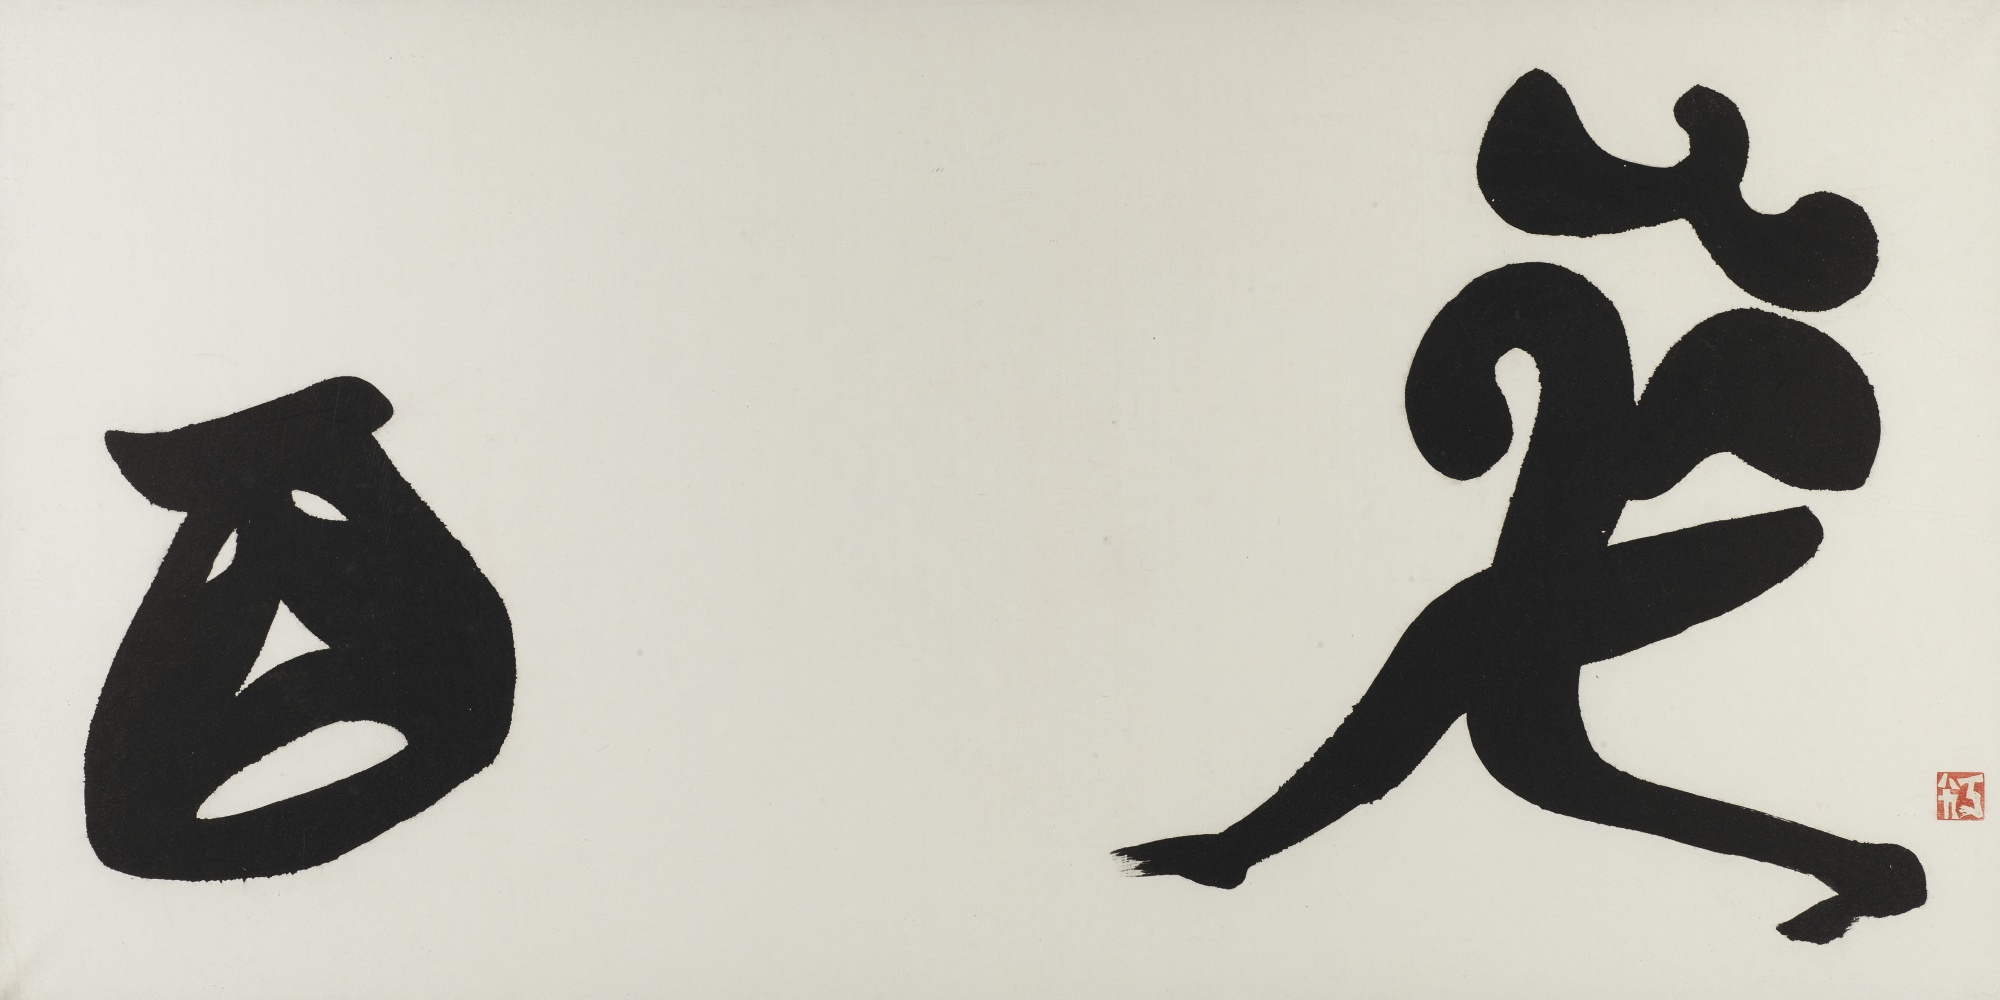 Ma Desheng-Drunk-1989